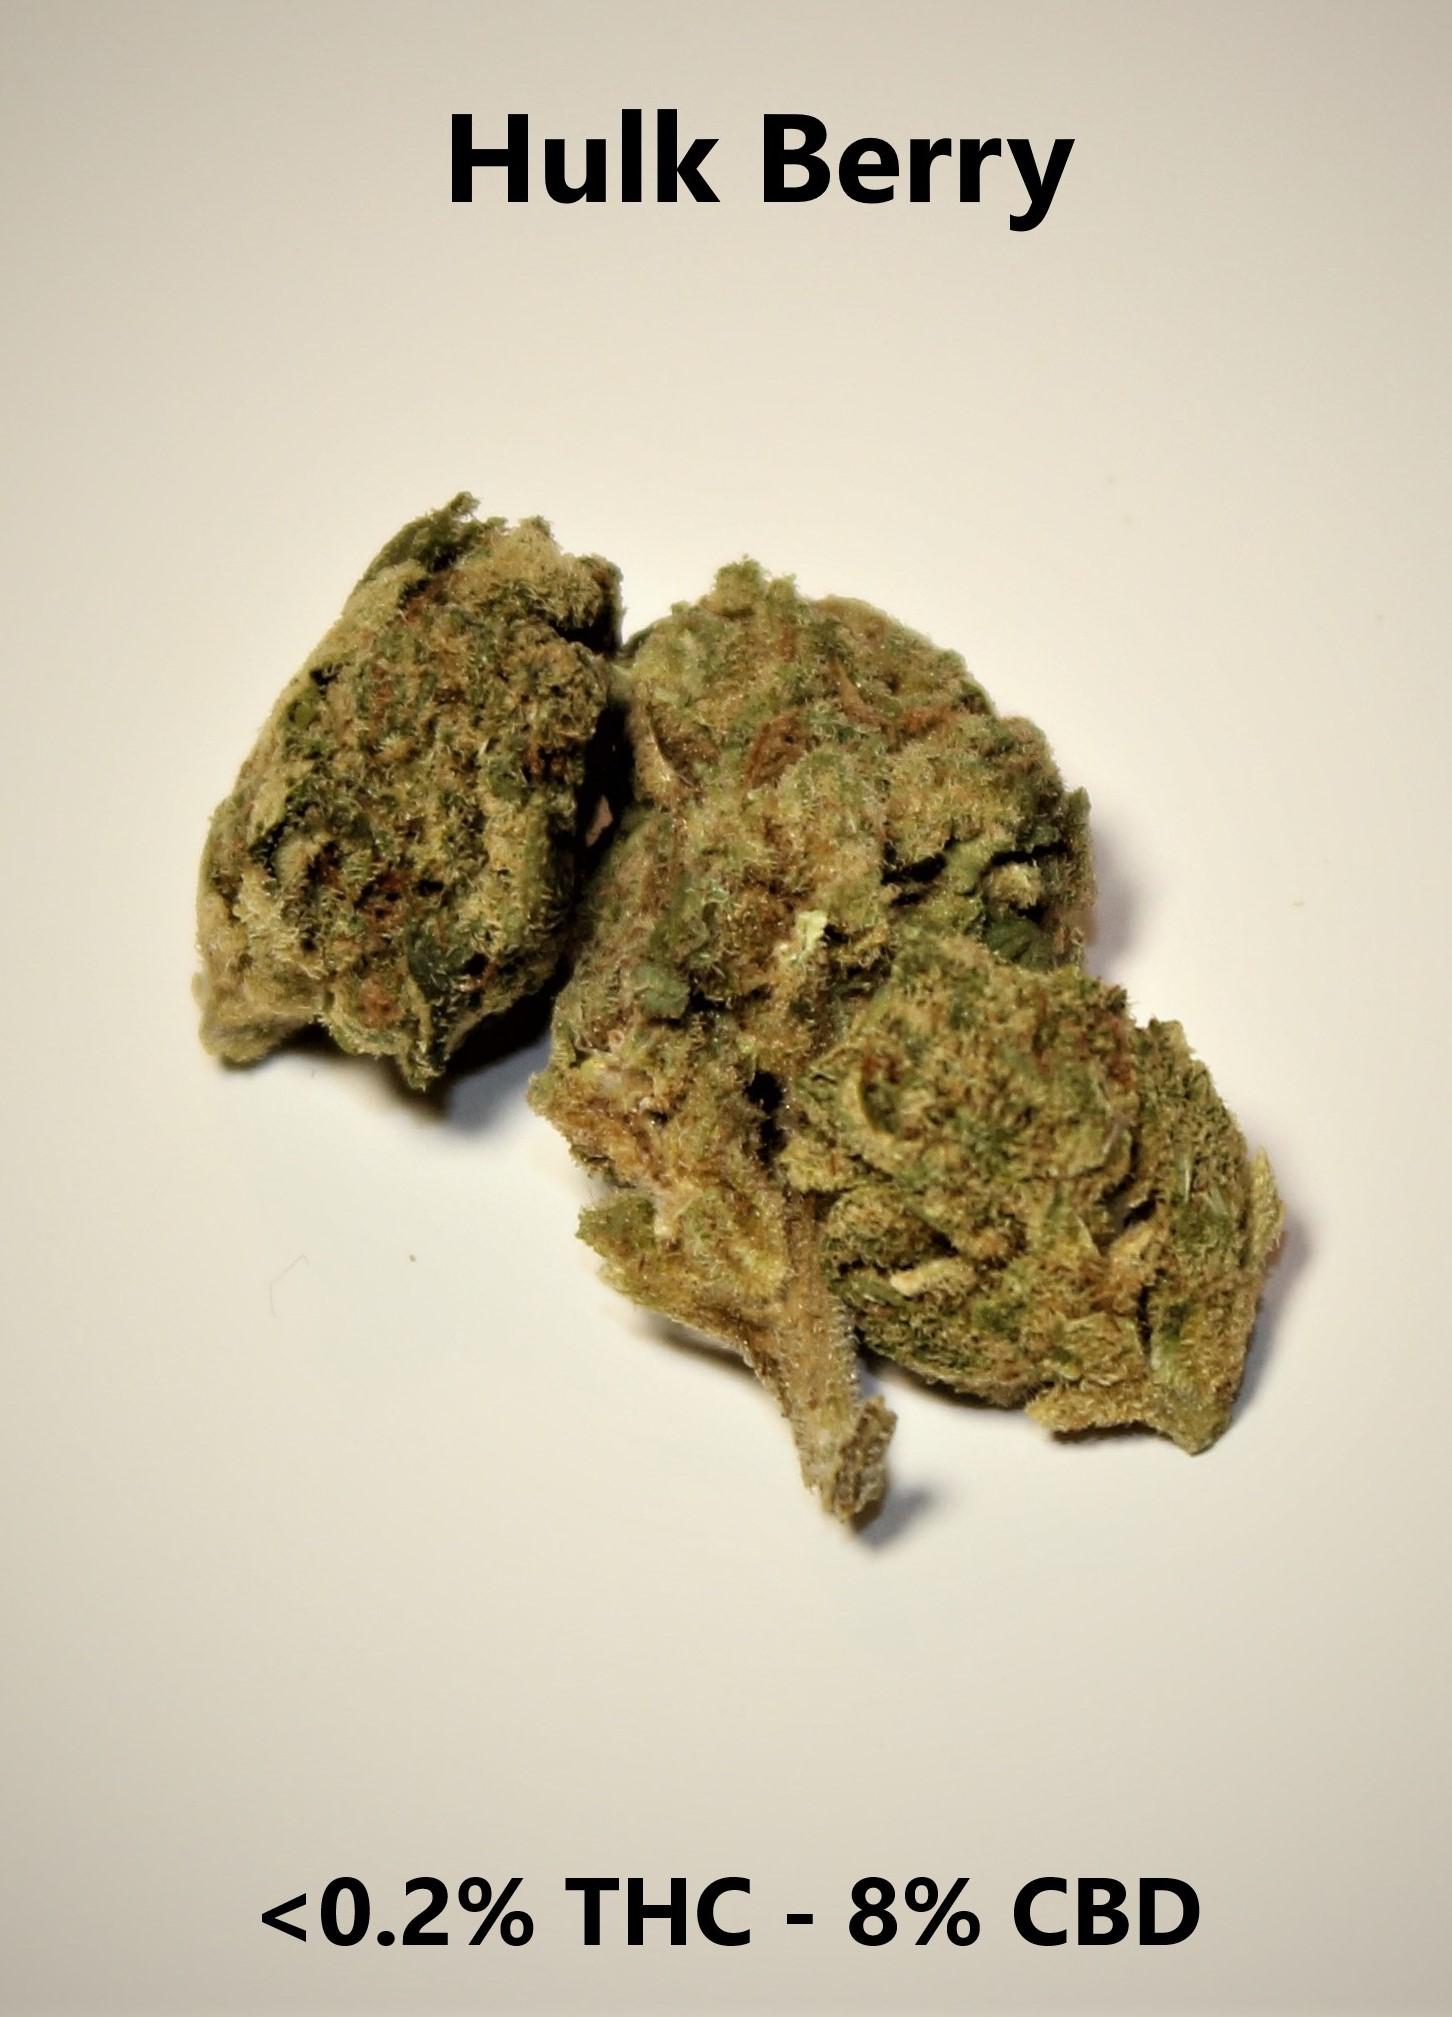 Hulk Berry - <0.2% THC / 8% CBD